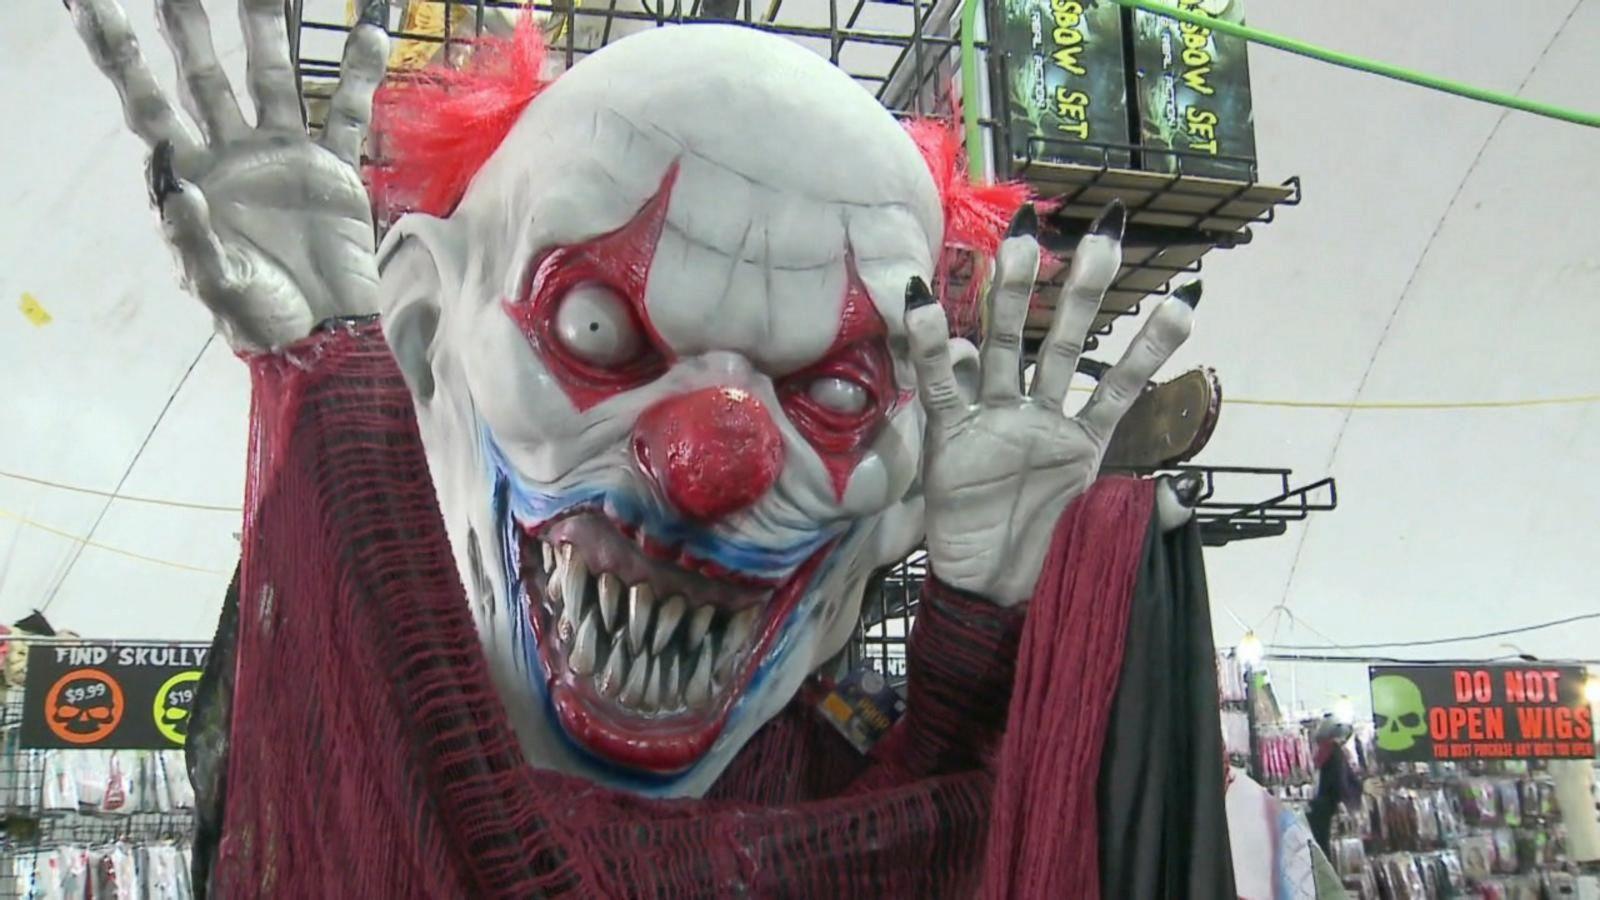 VIDEO: Target Pulls Clown Masks from Shelves Ahead of Halloween